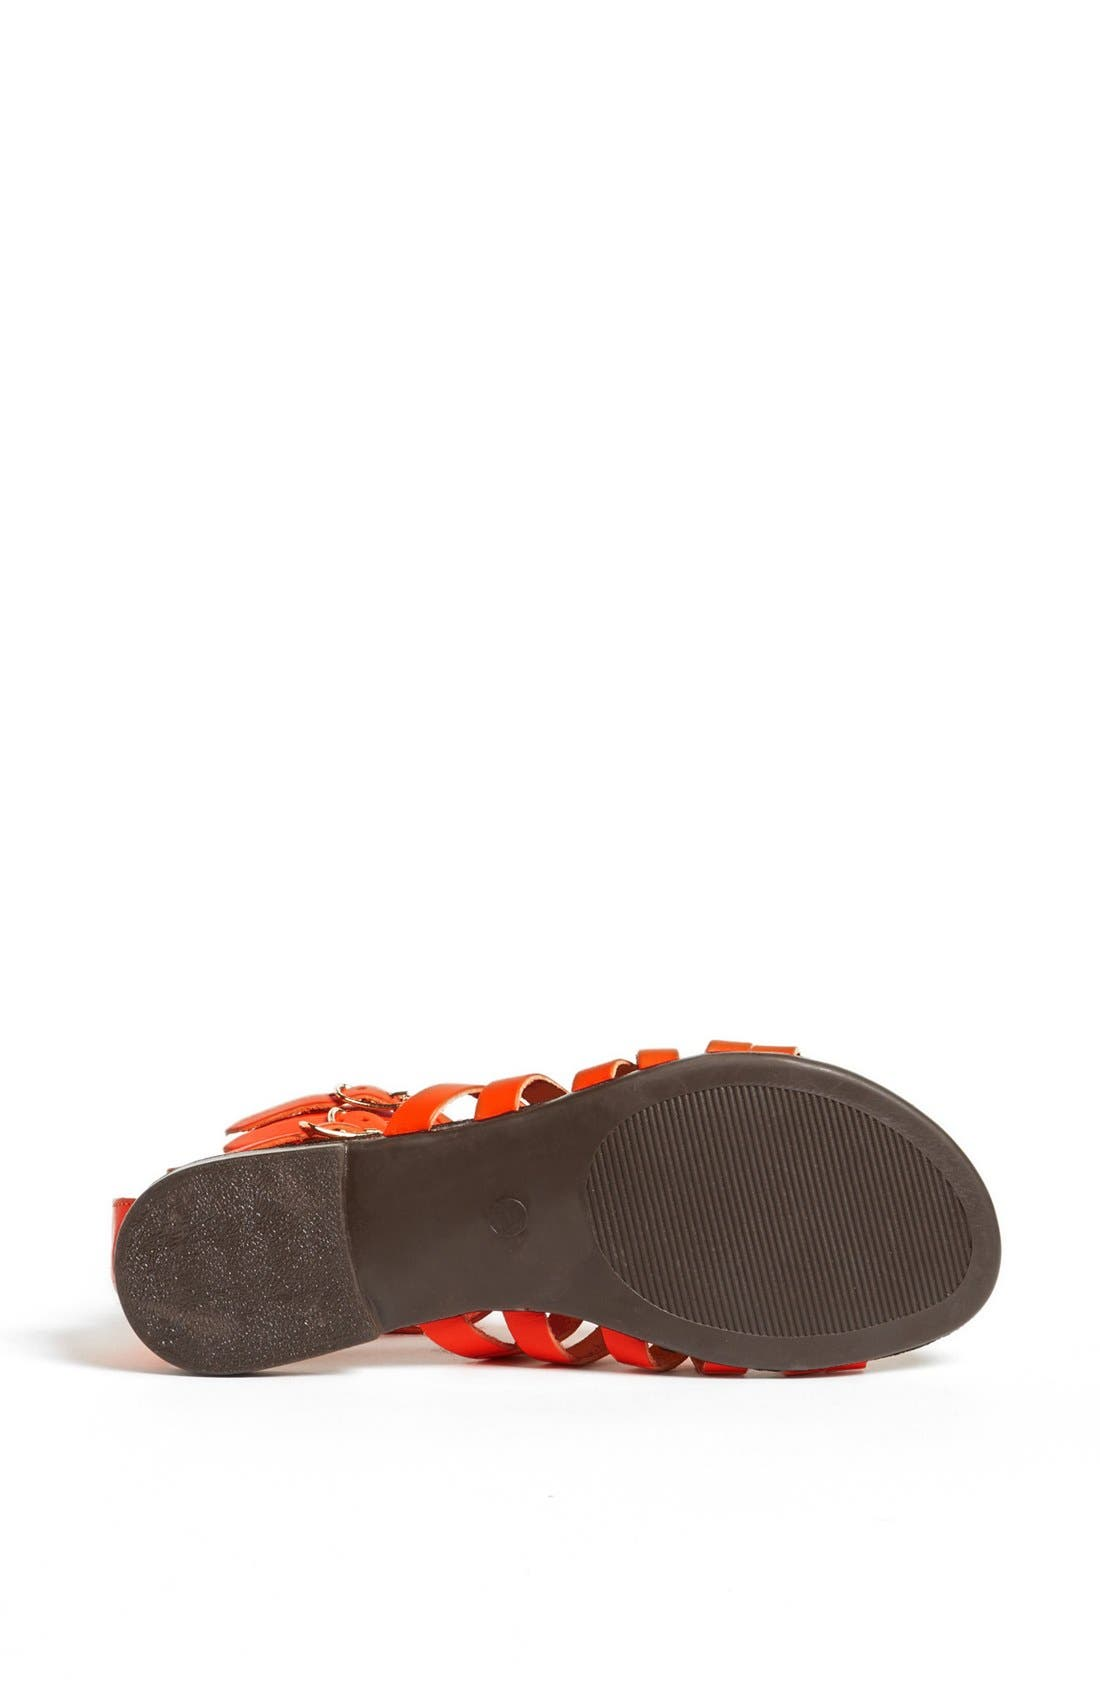 'Plato' Sandal,                             Alternate thumbnail 4, color,                             Orange